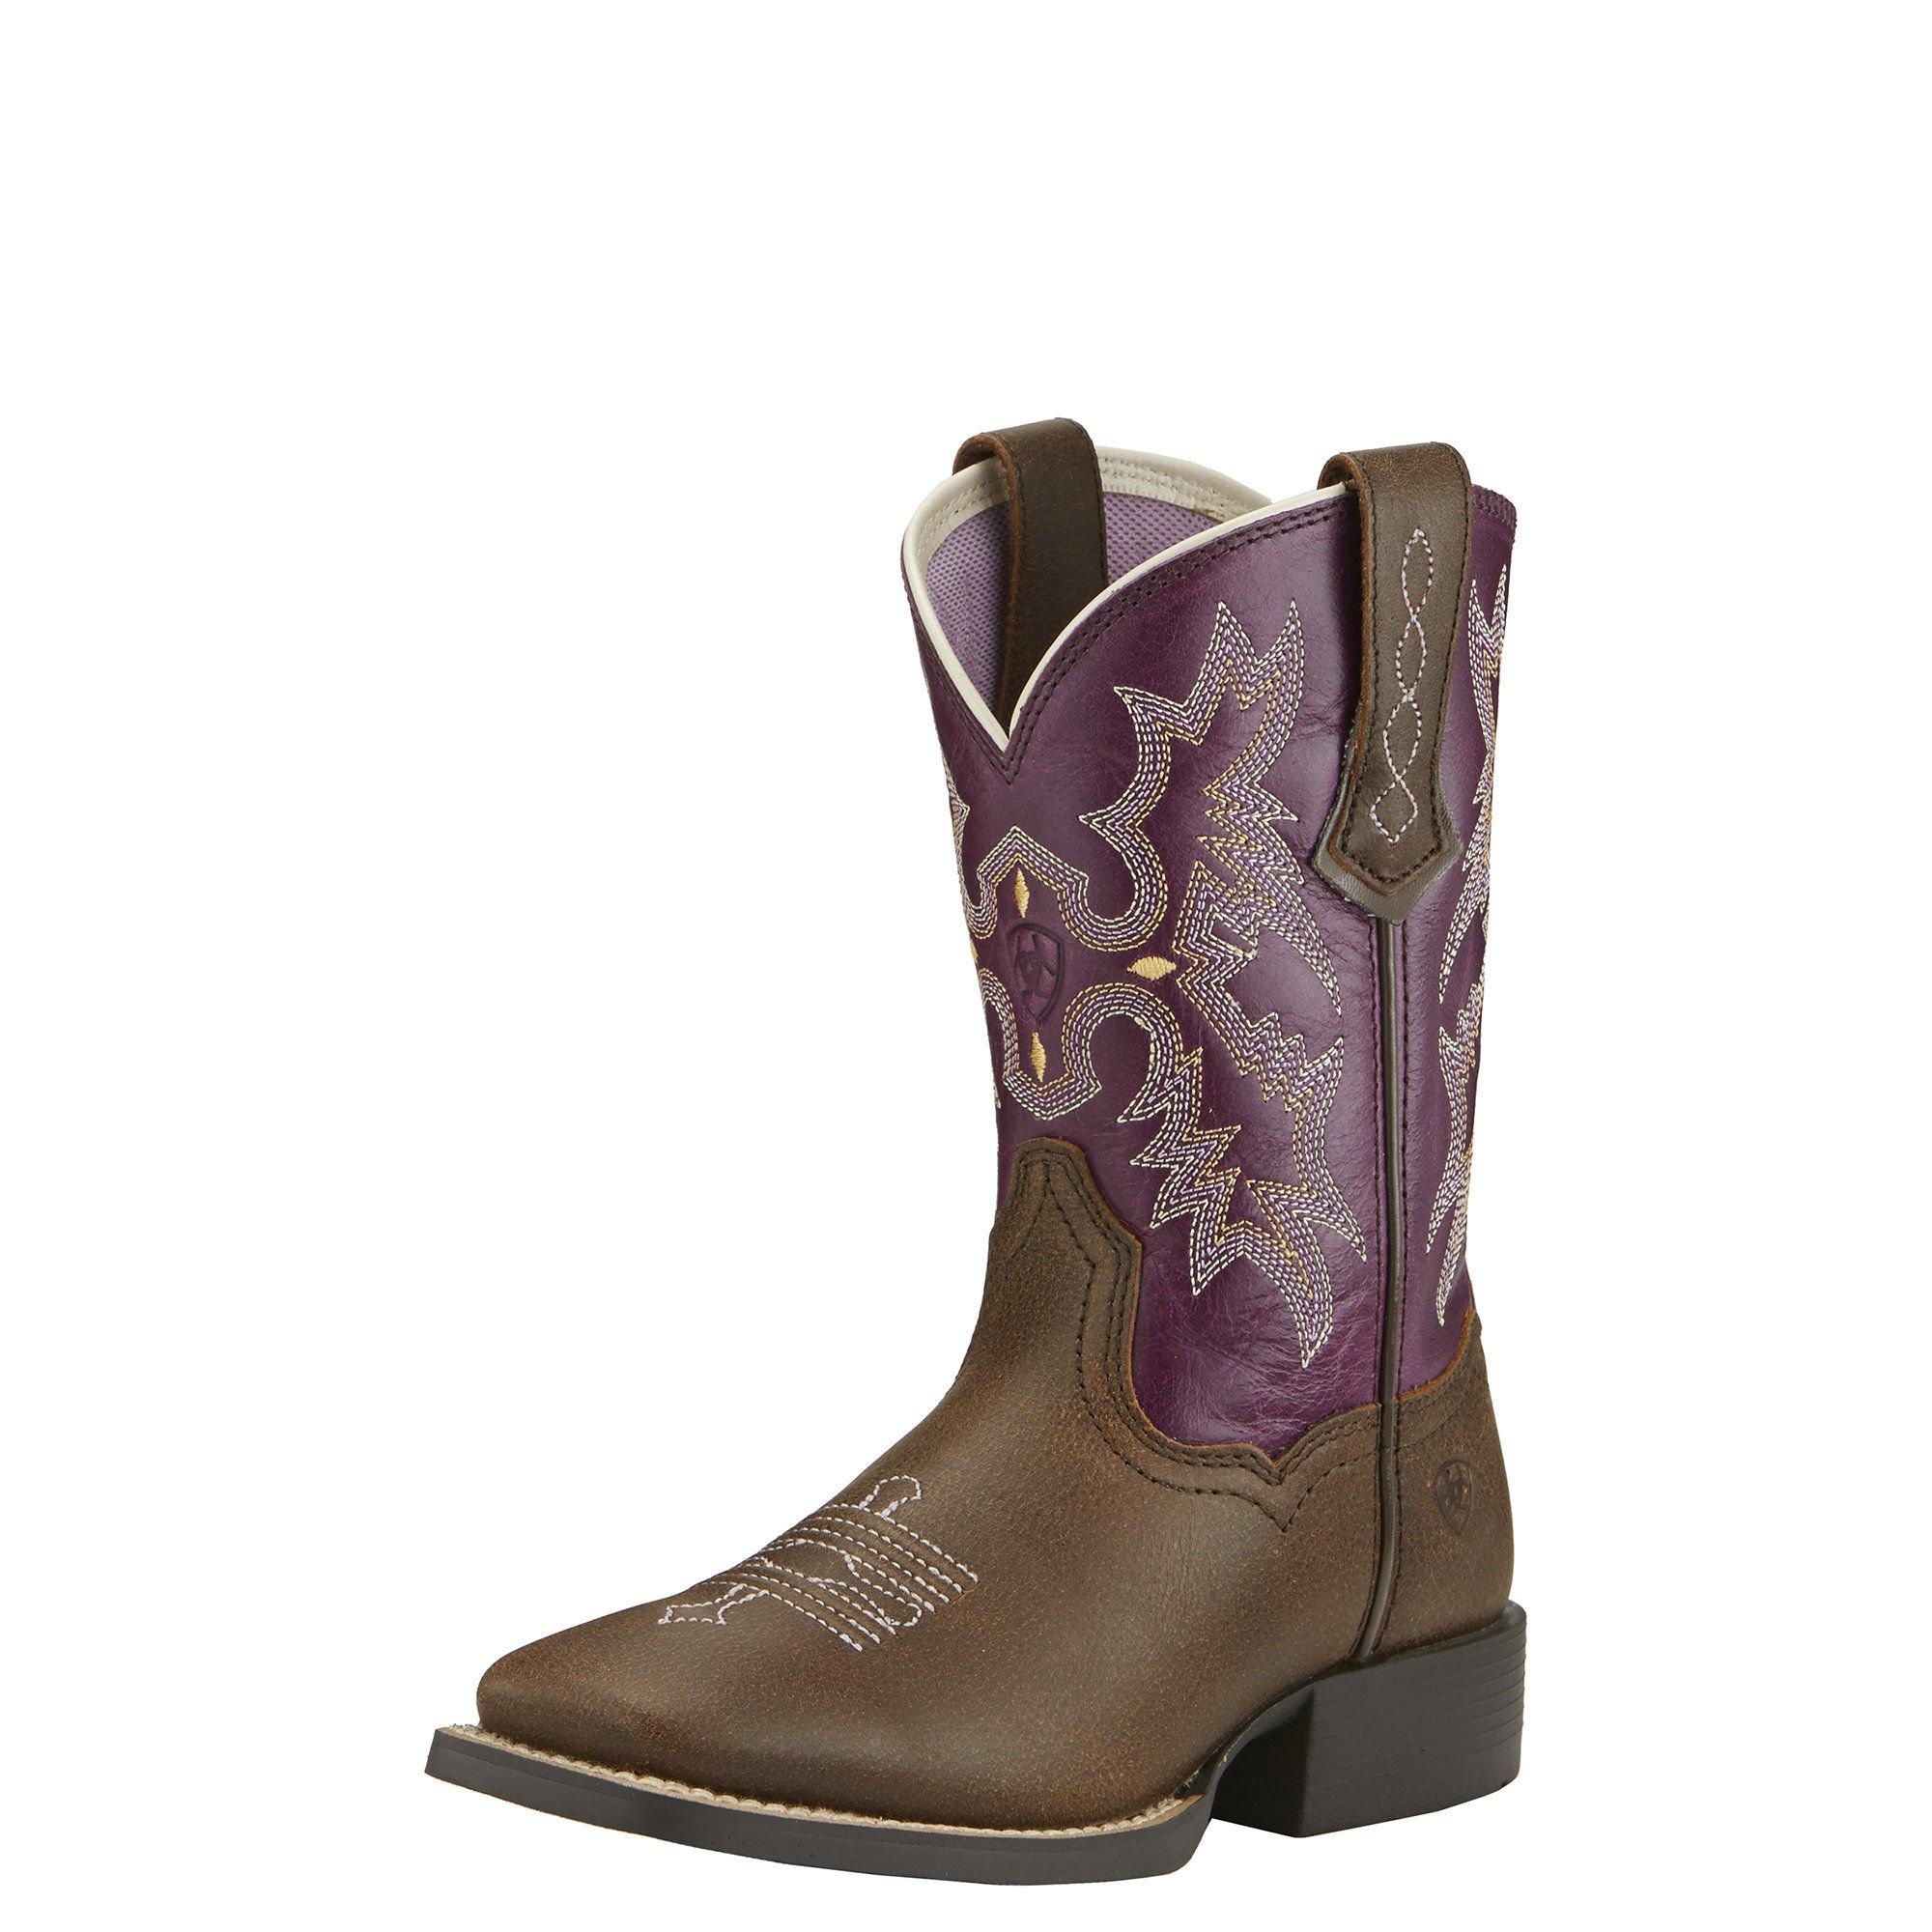 Kids' Tombstone Western Cowboy Boot, Vintage Bomber/Plum, 3.5 M US Big Kid by Ariat